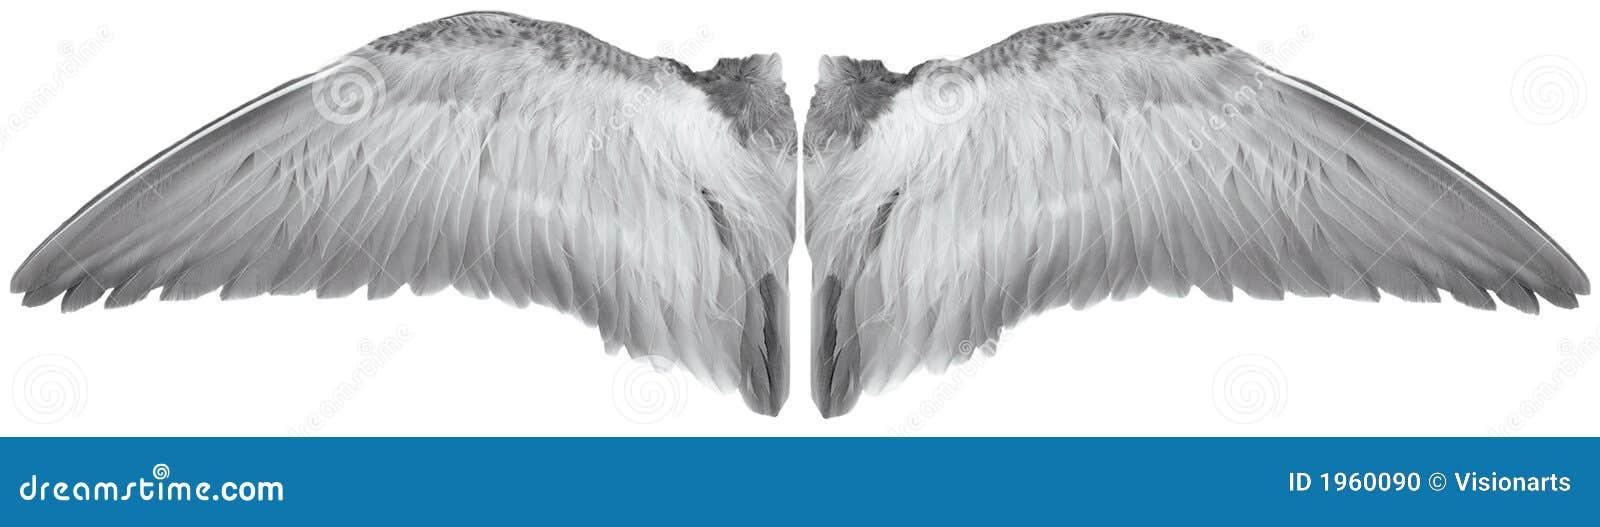 Skrzydła ptaka